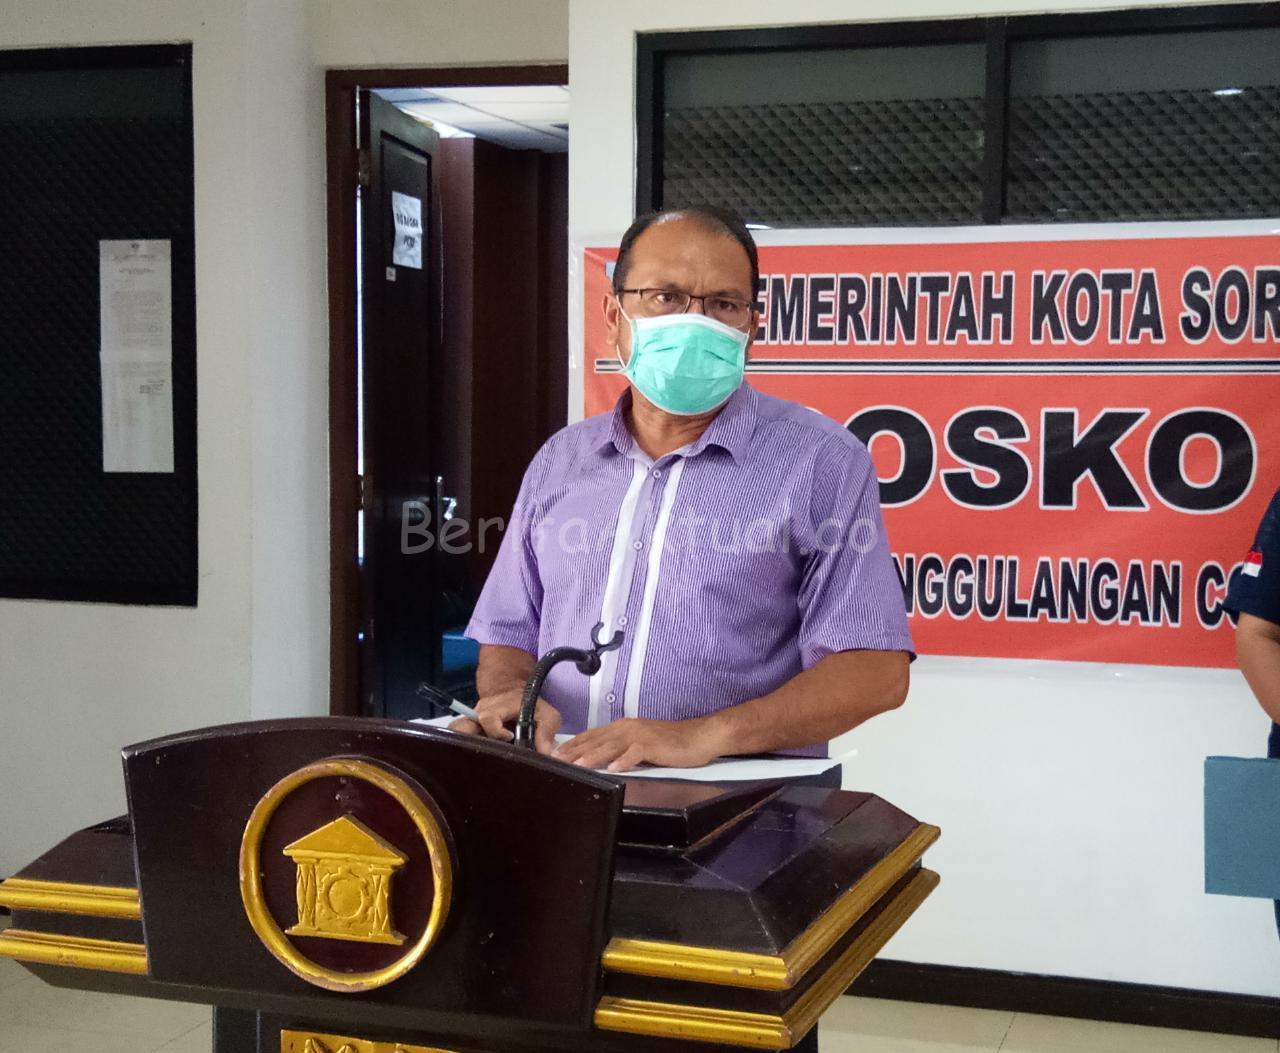 Pemkot Sorong Siapkan Lahan Pemakaman Jenazah Covid-19 di Kilometer 12 Masuk 4 IMG 20200404 WA0041